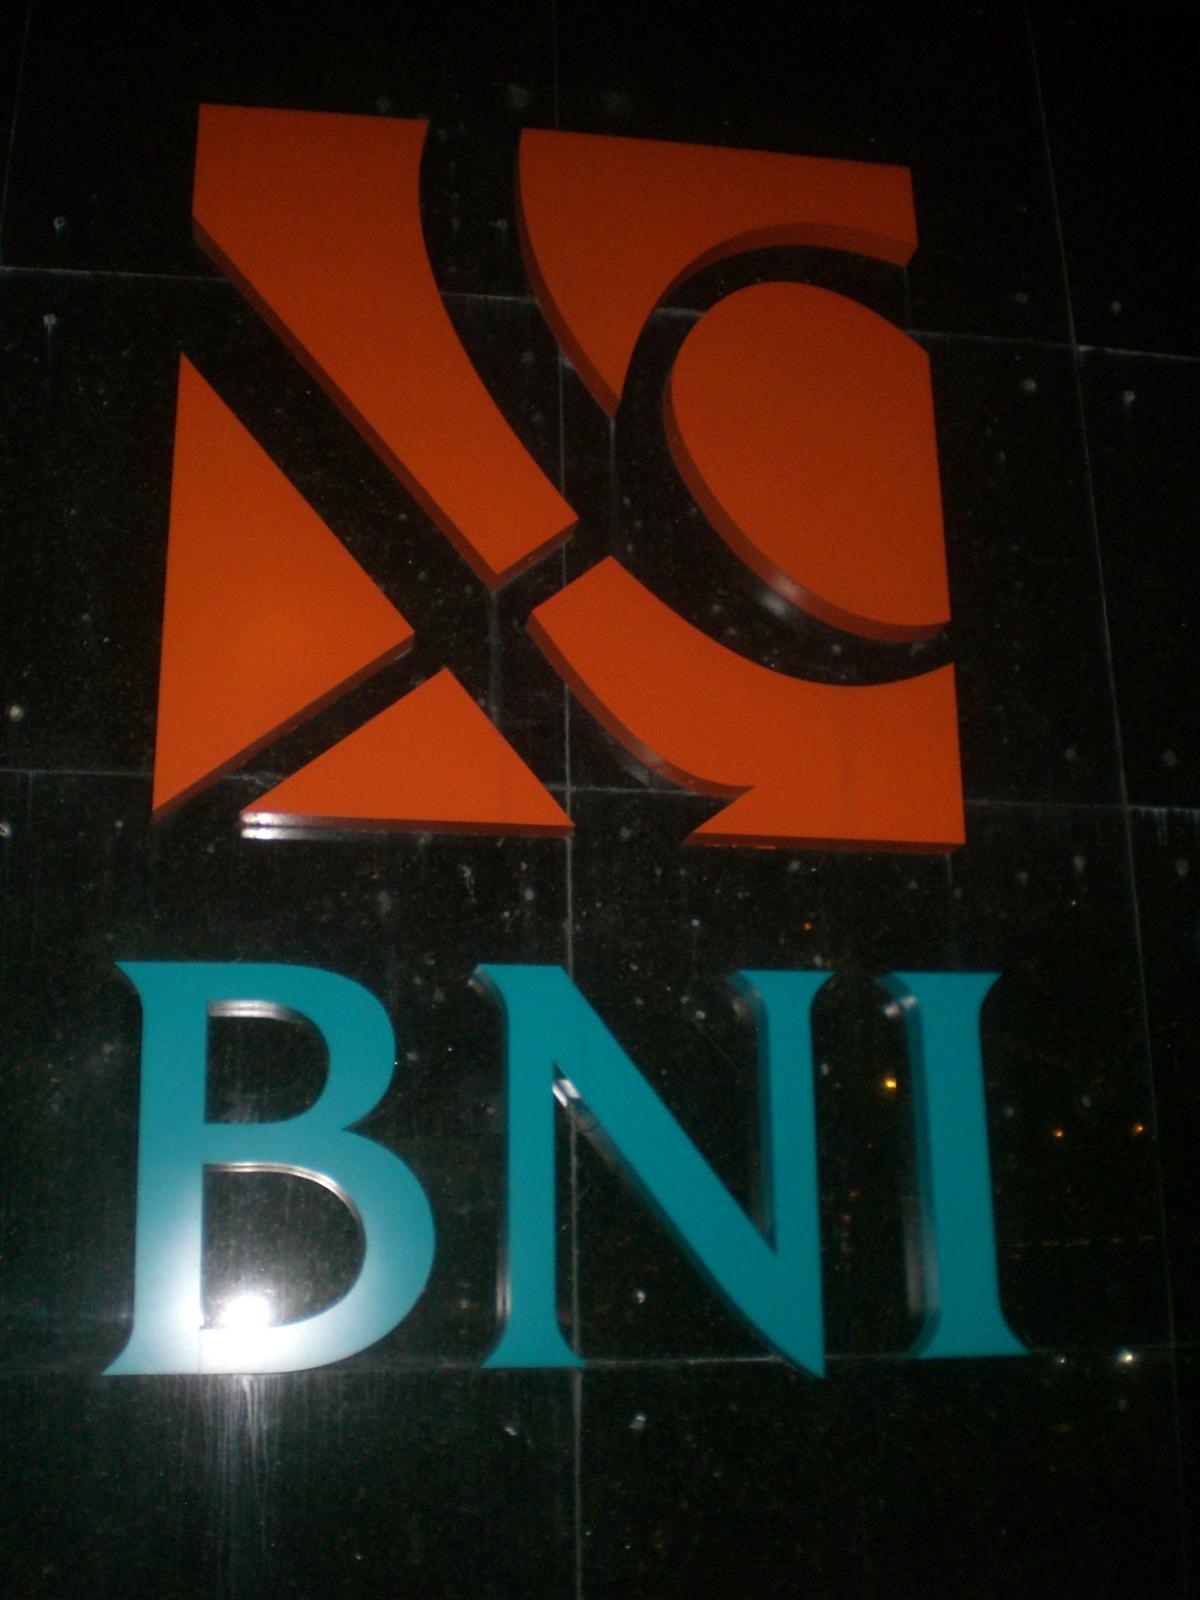 Bank Bni Logo : File:HK, Admiralty, Night, Finance, Centre, Negara, Indonesia, BNI.JPG, Wikimedia, Commons